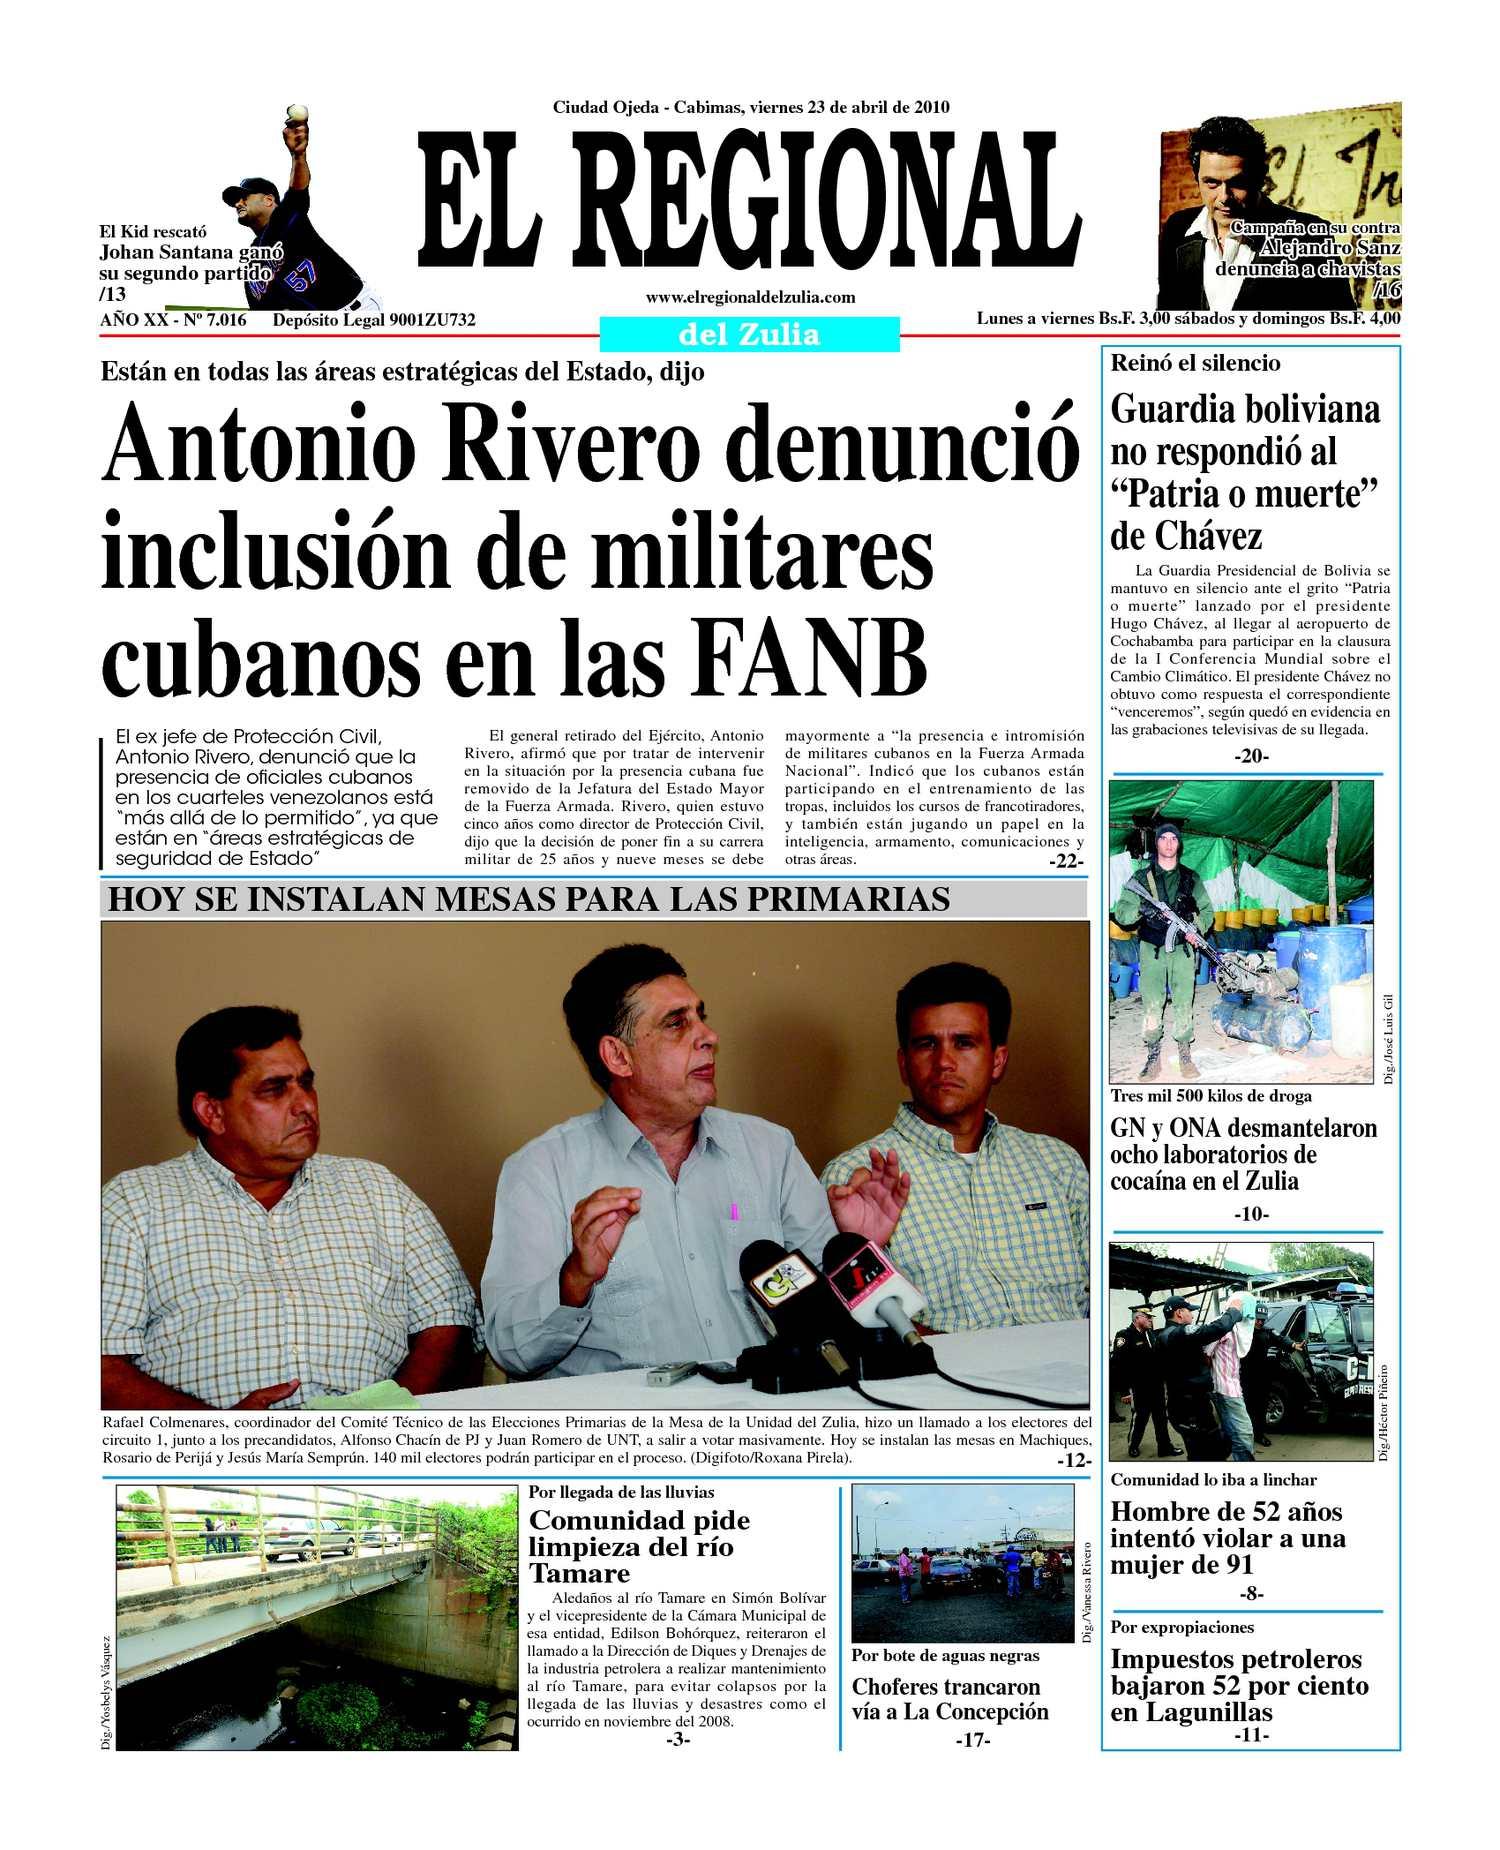 El Regional del Zuia 23-04-2010